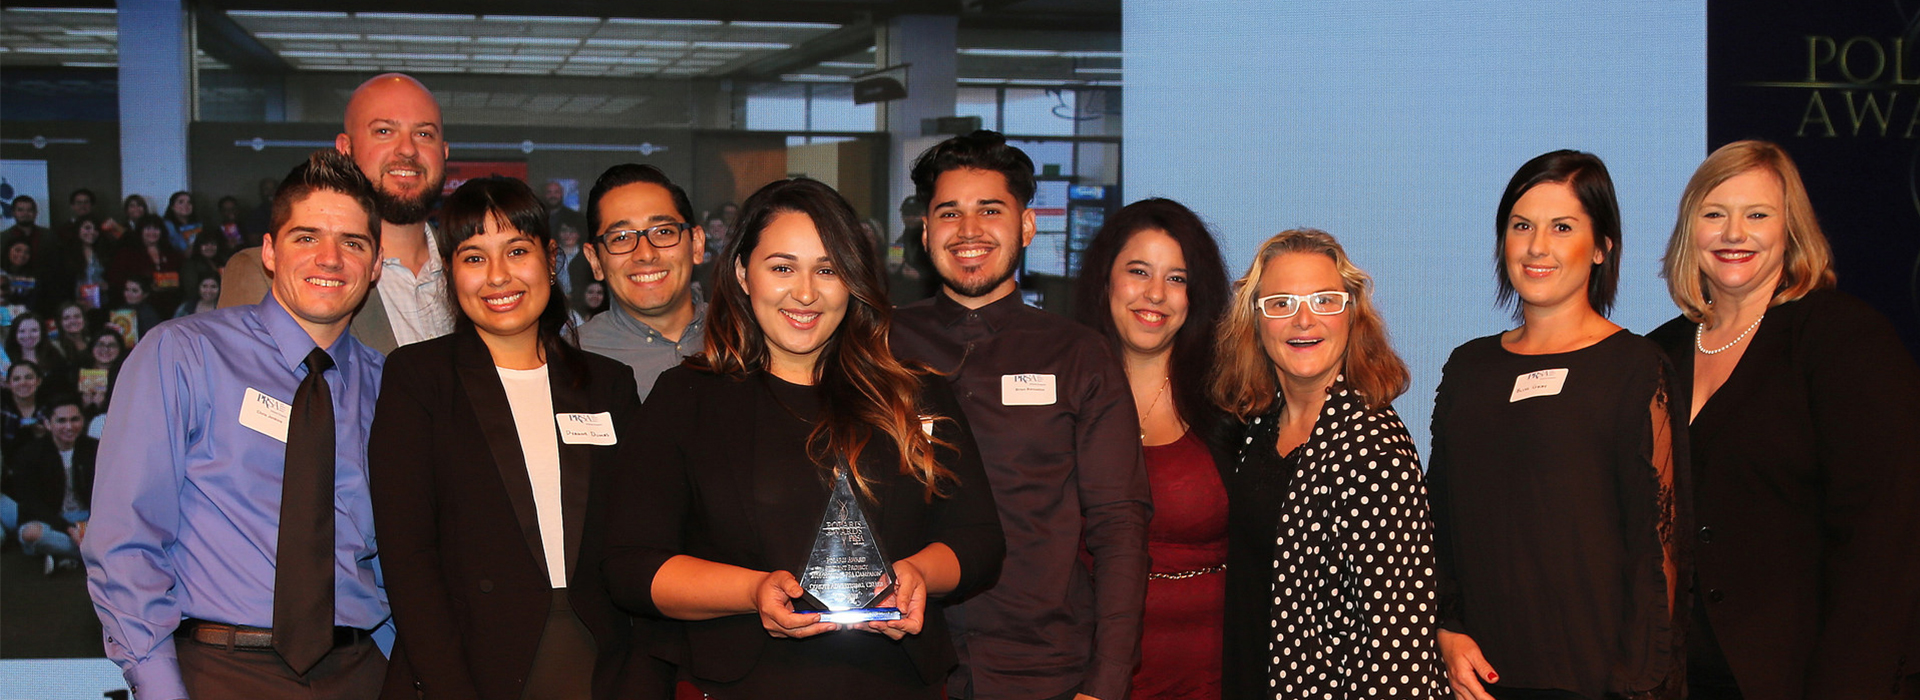 Cal State San Bernardino wins two Polaris Awards by the PRSA Inland Empire Chapter